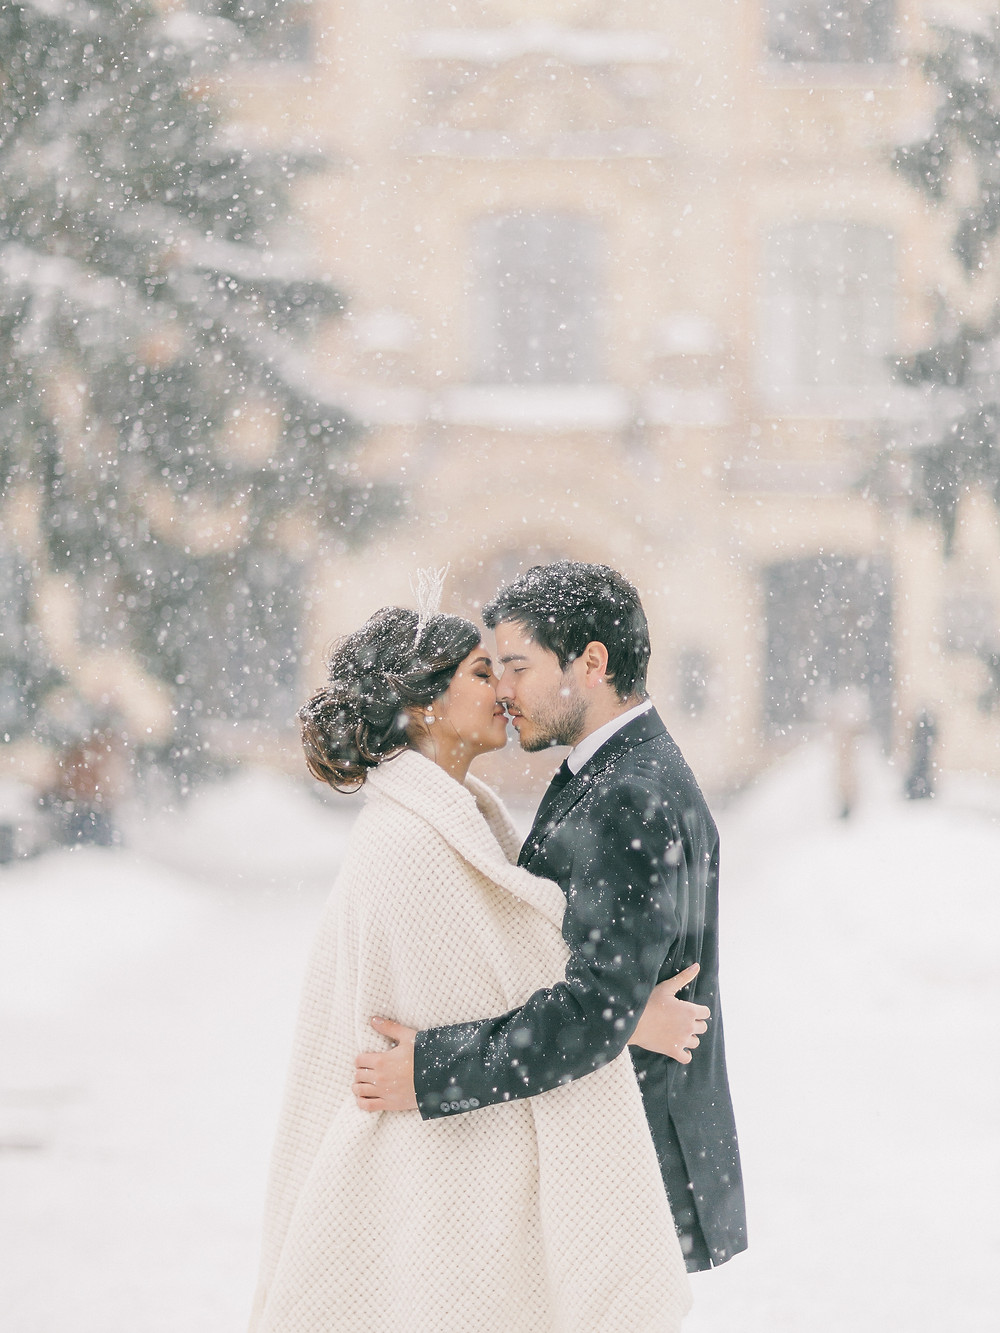 Winterbraut Wedding Wiesbaden